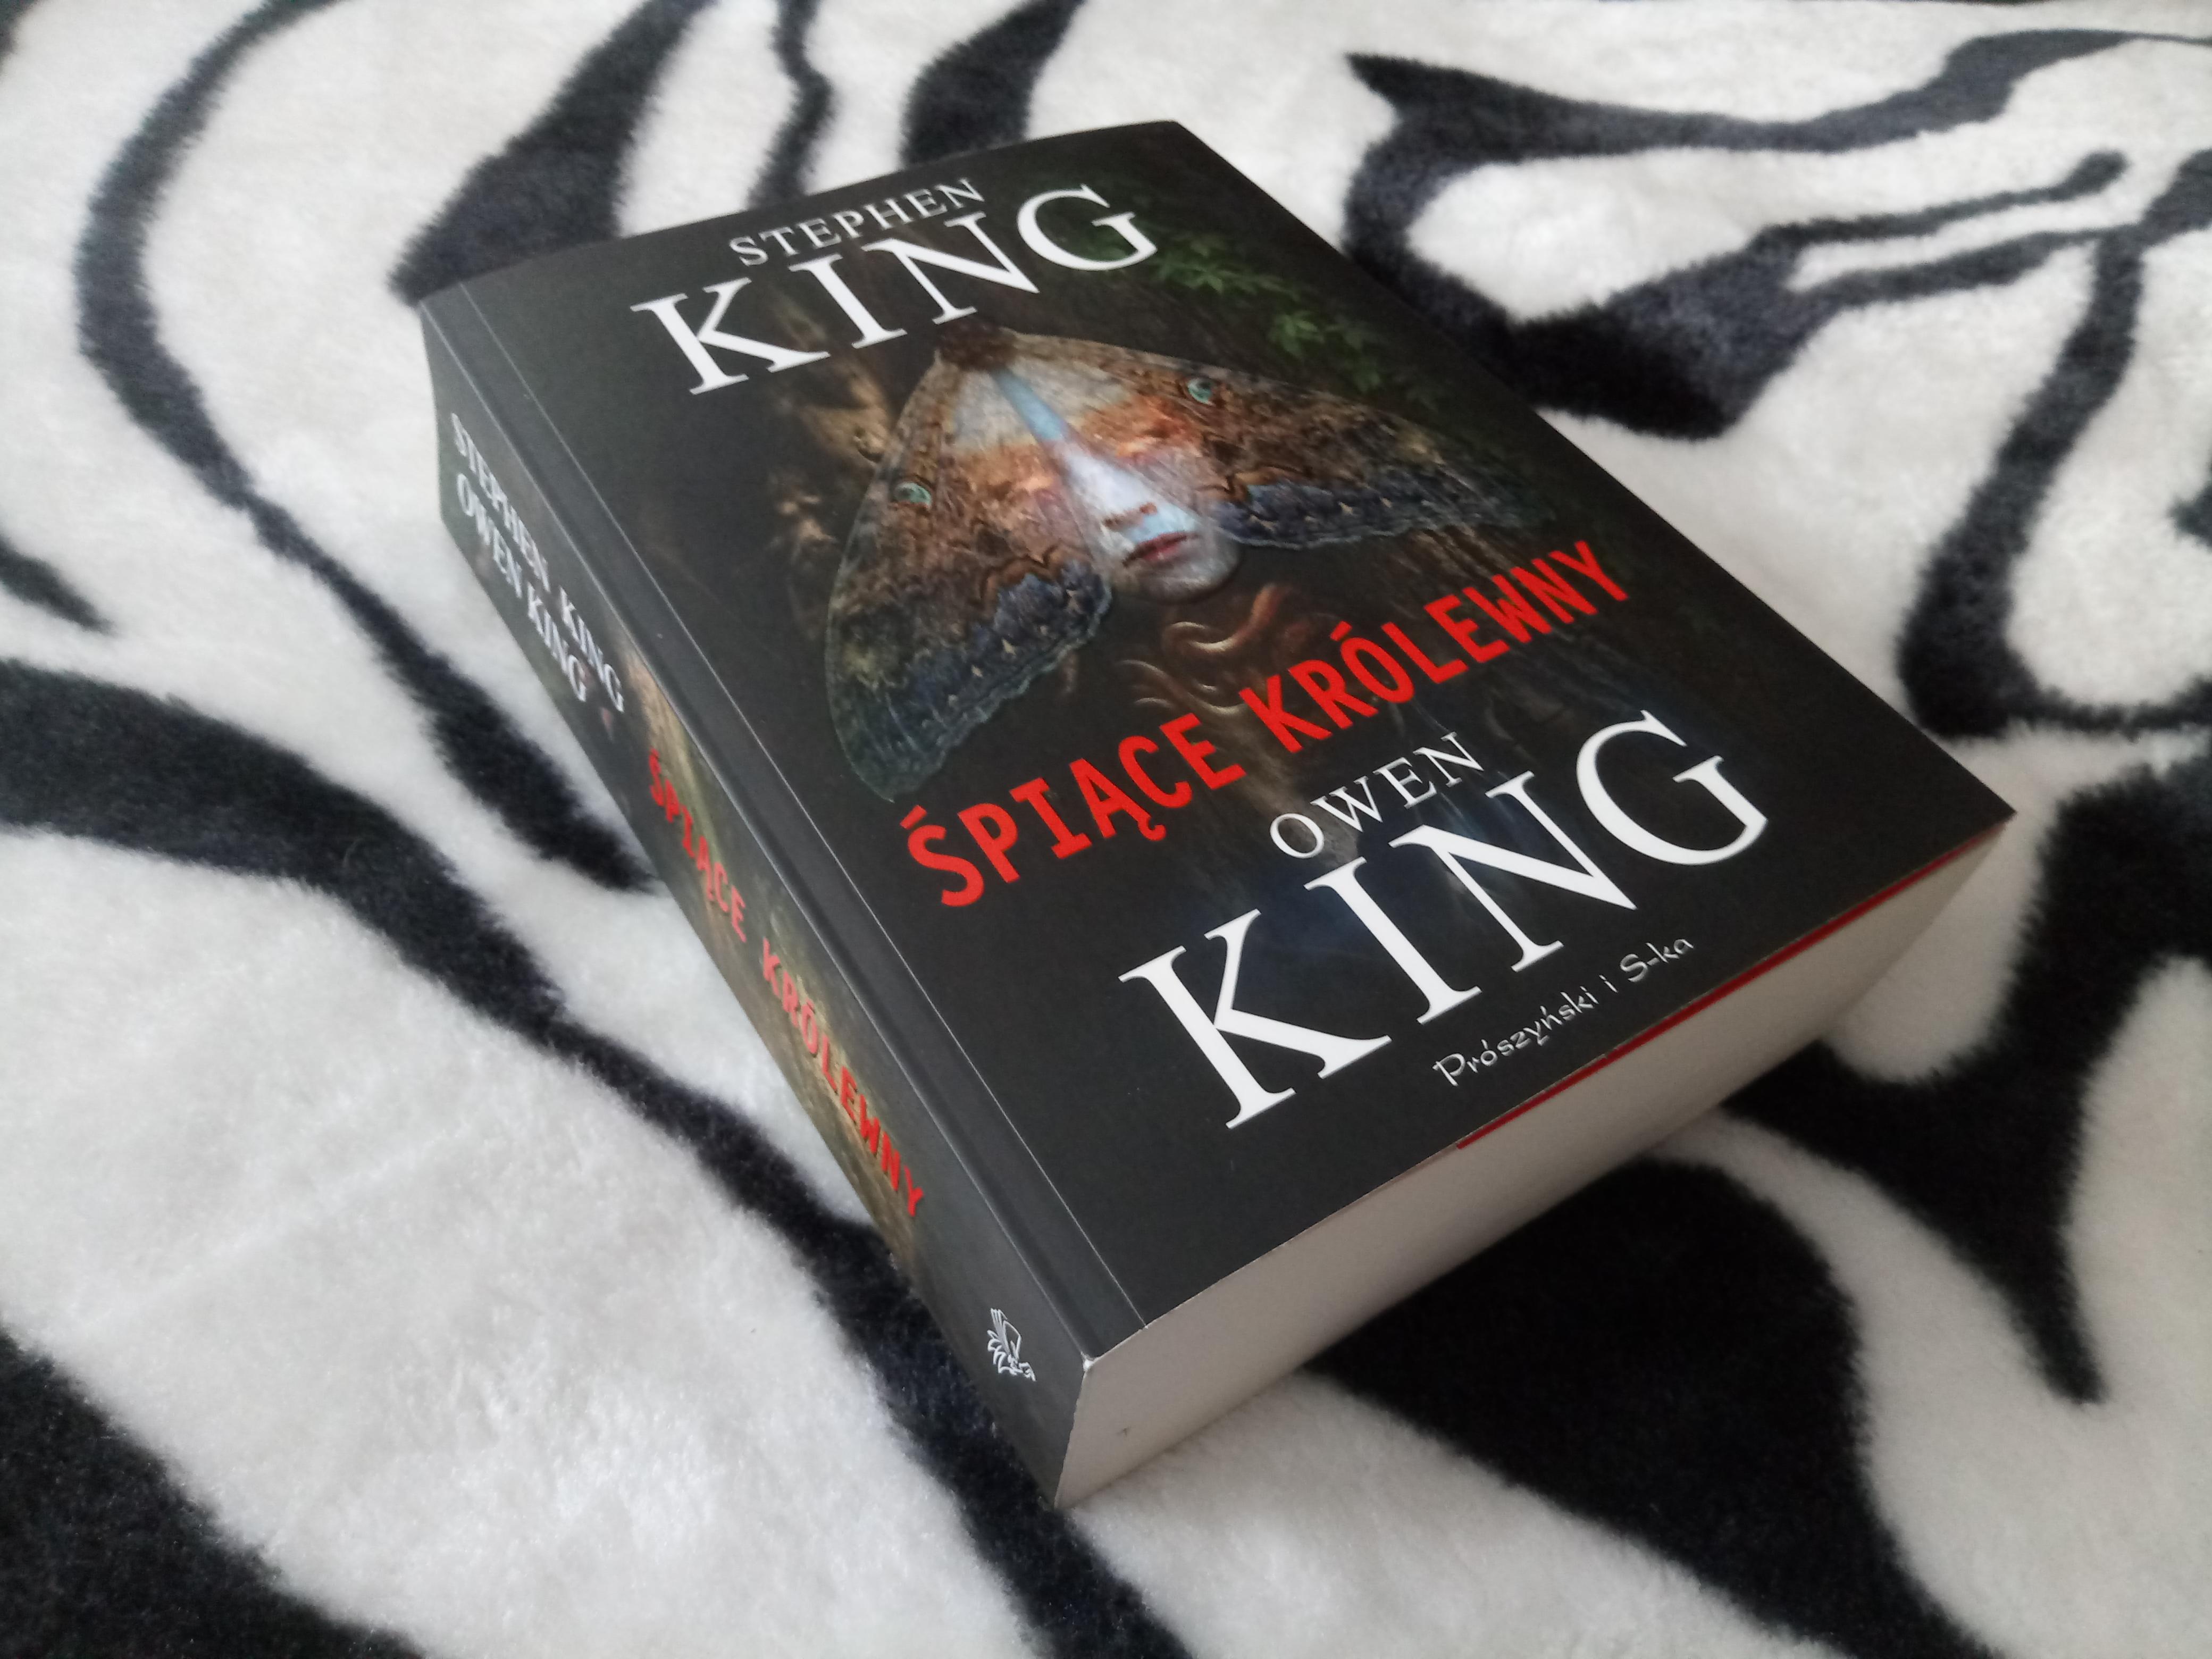 Śpiące królewny – Stephen King/Owen King